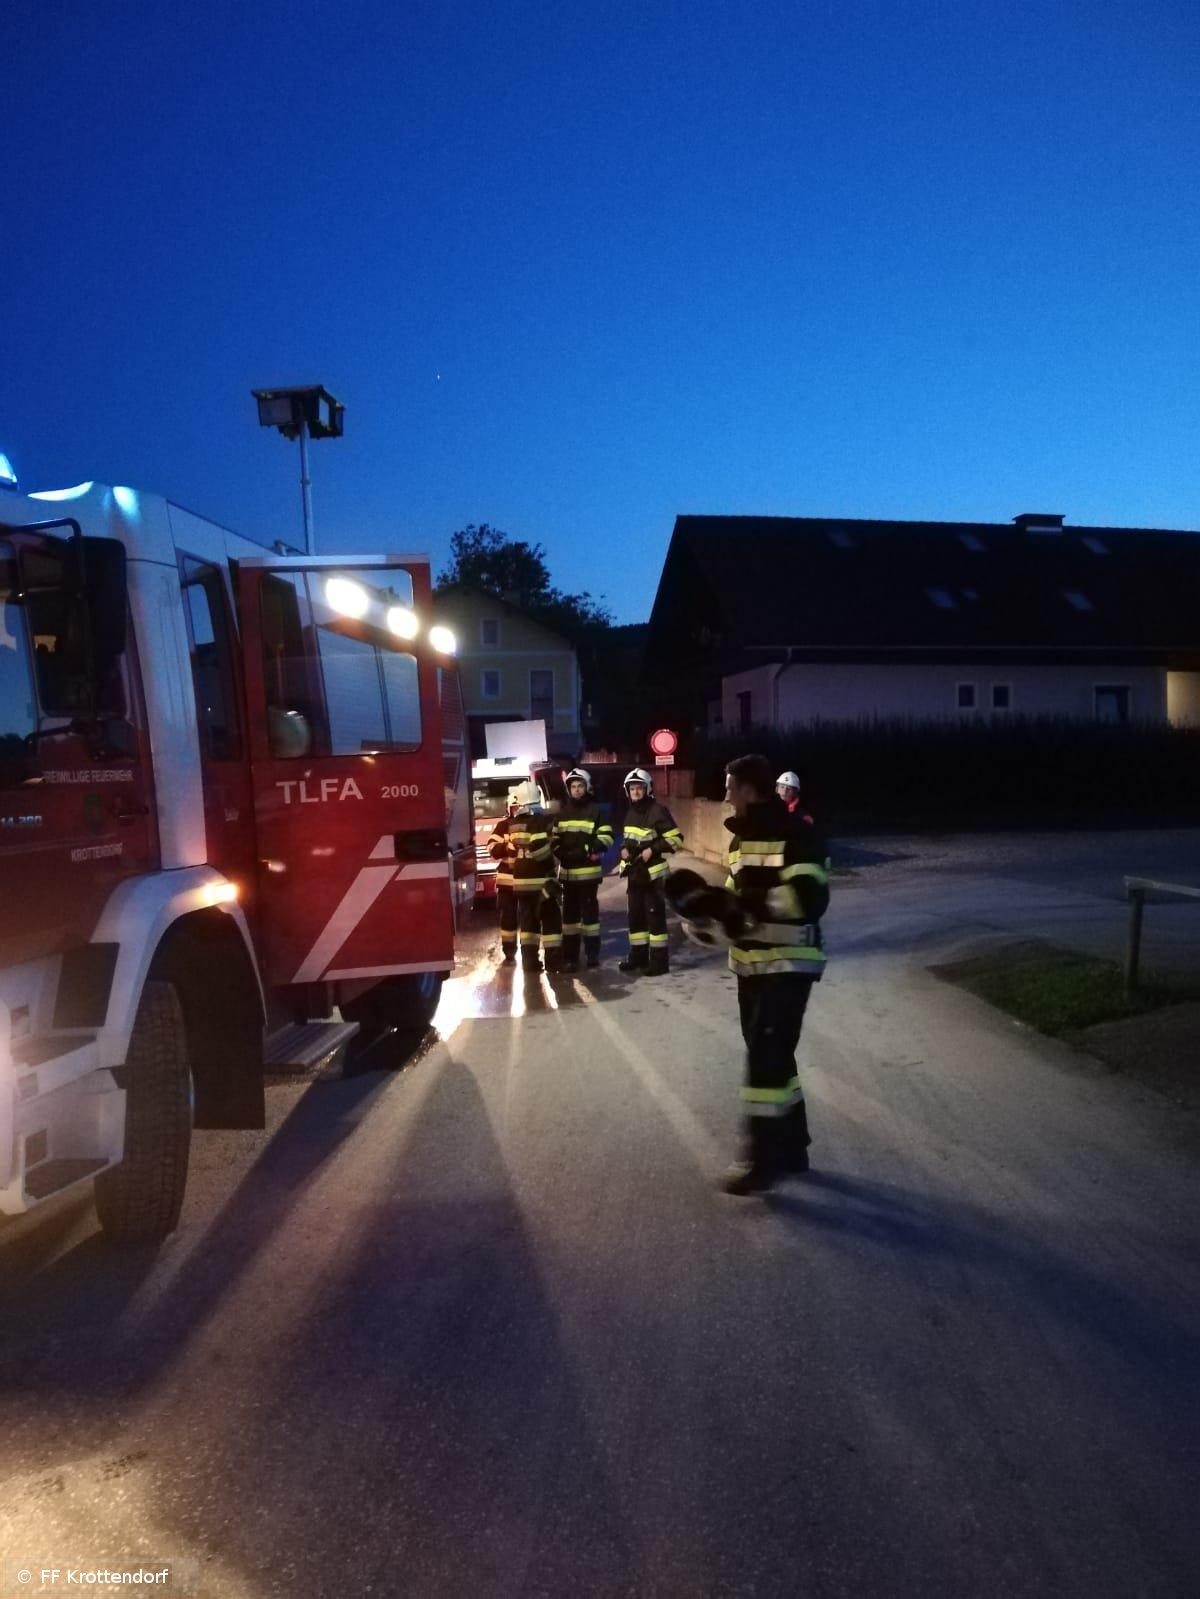 Übung vom 09.09.2019  |  © FF-Krottendorf (2019)